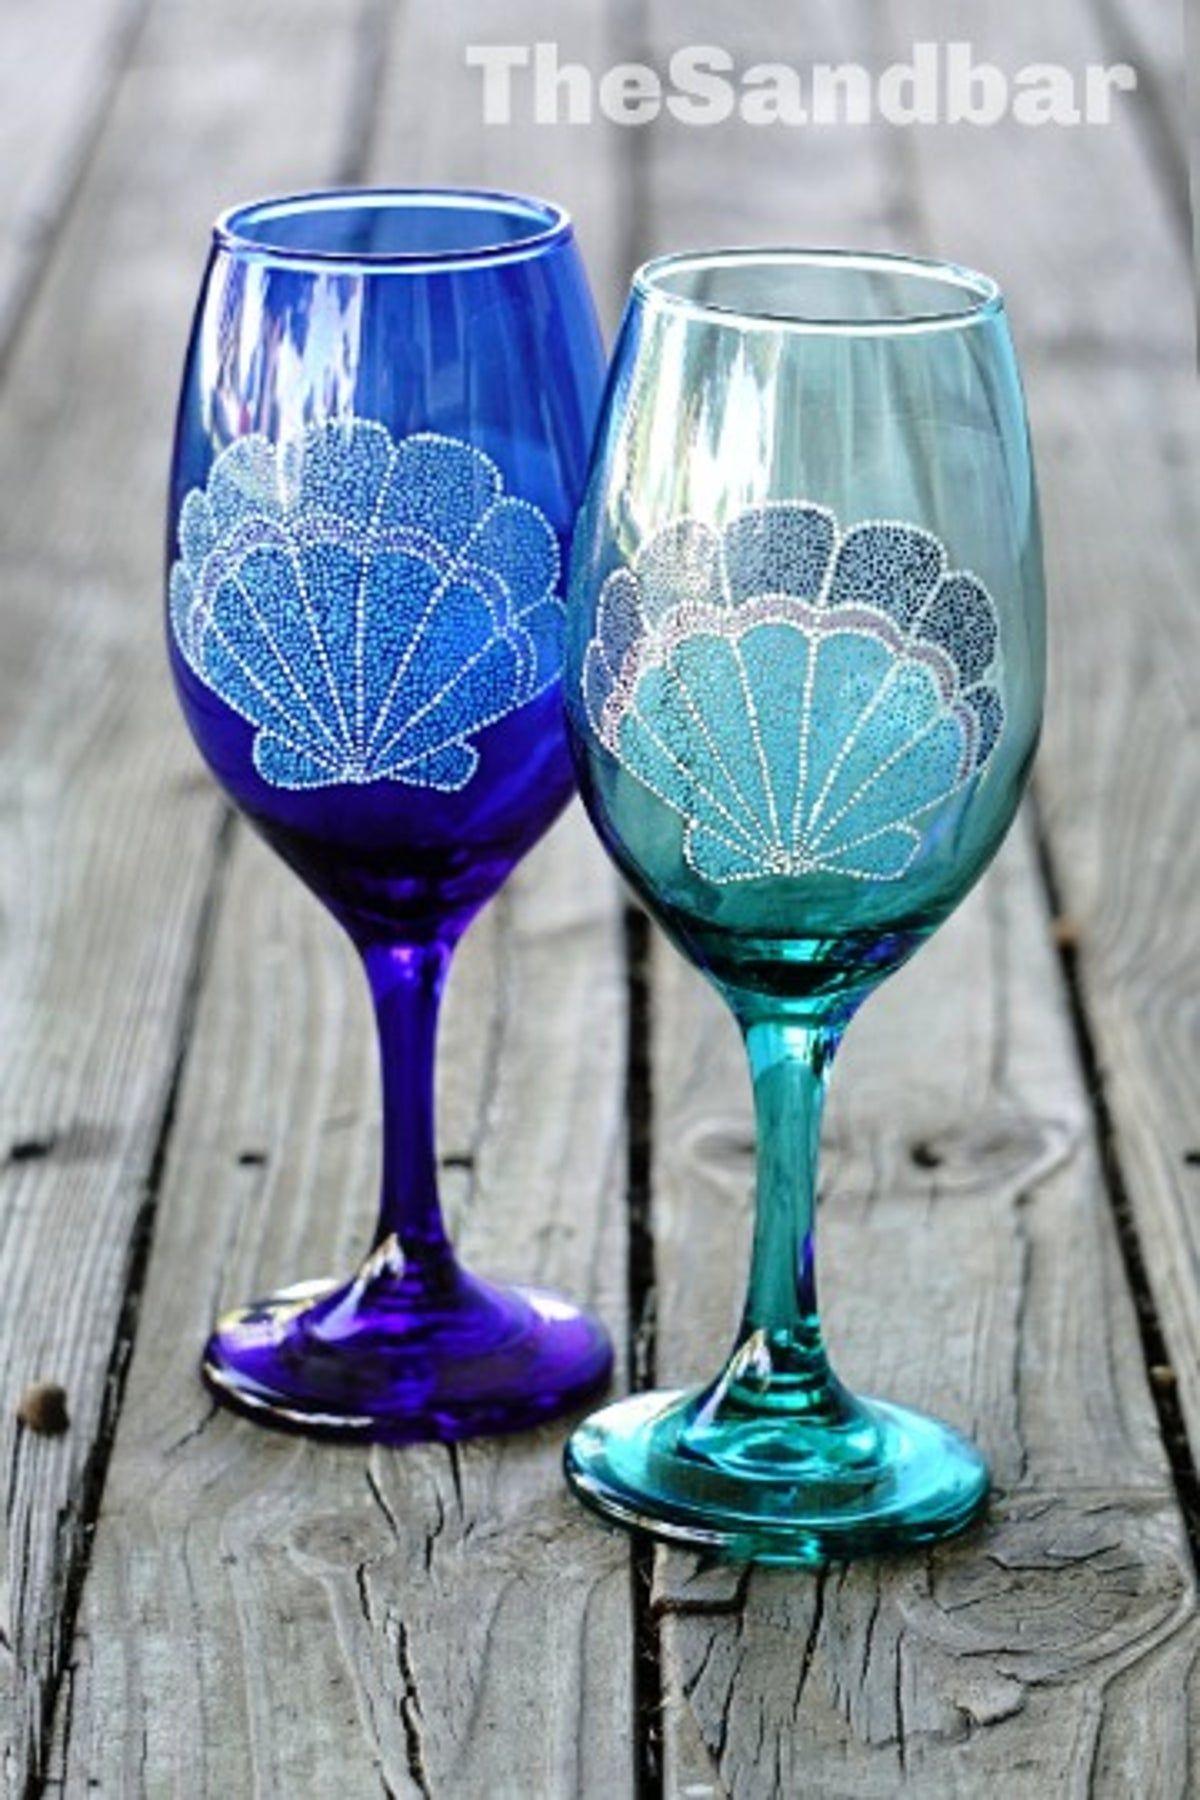 Set of 2 Wine Seashell Glasses